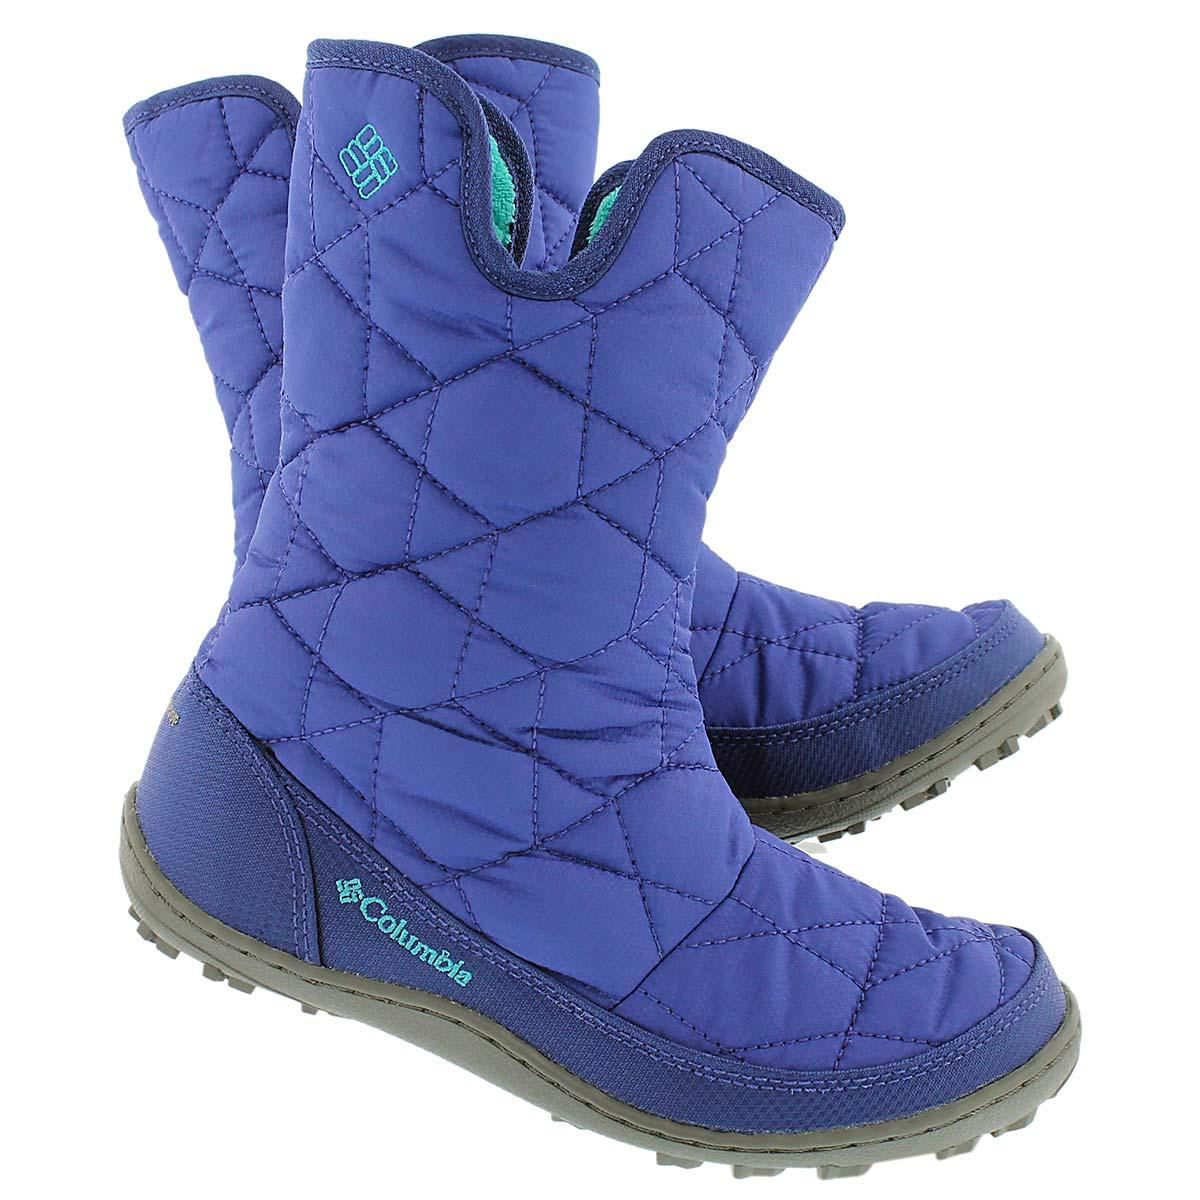 Grls Minx Slip grape winter boot